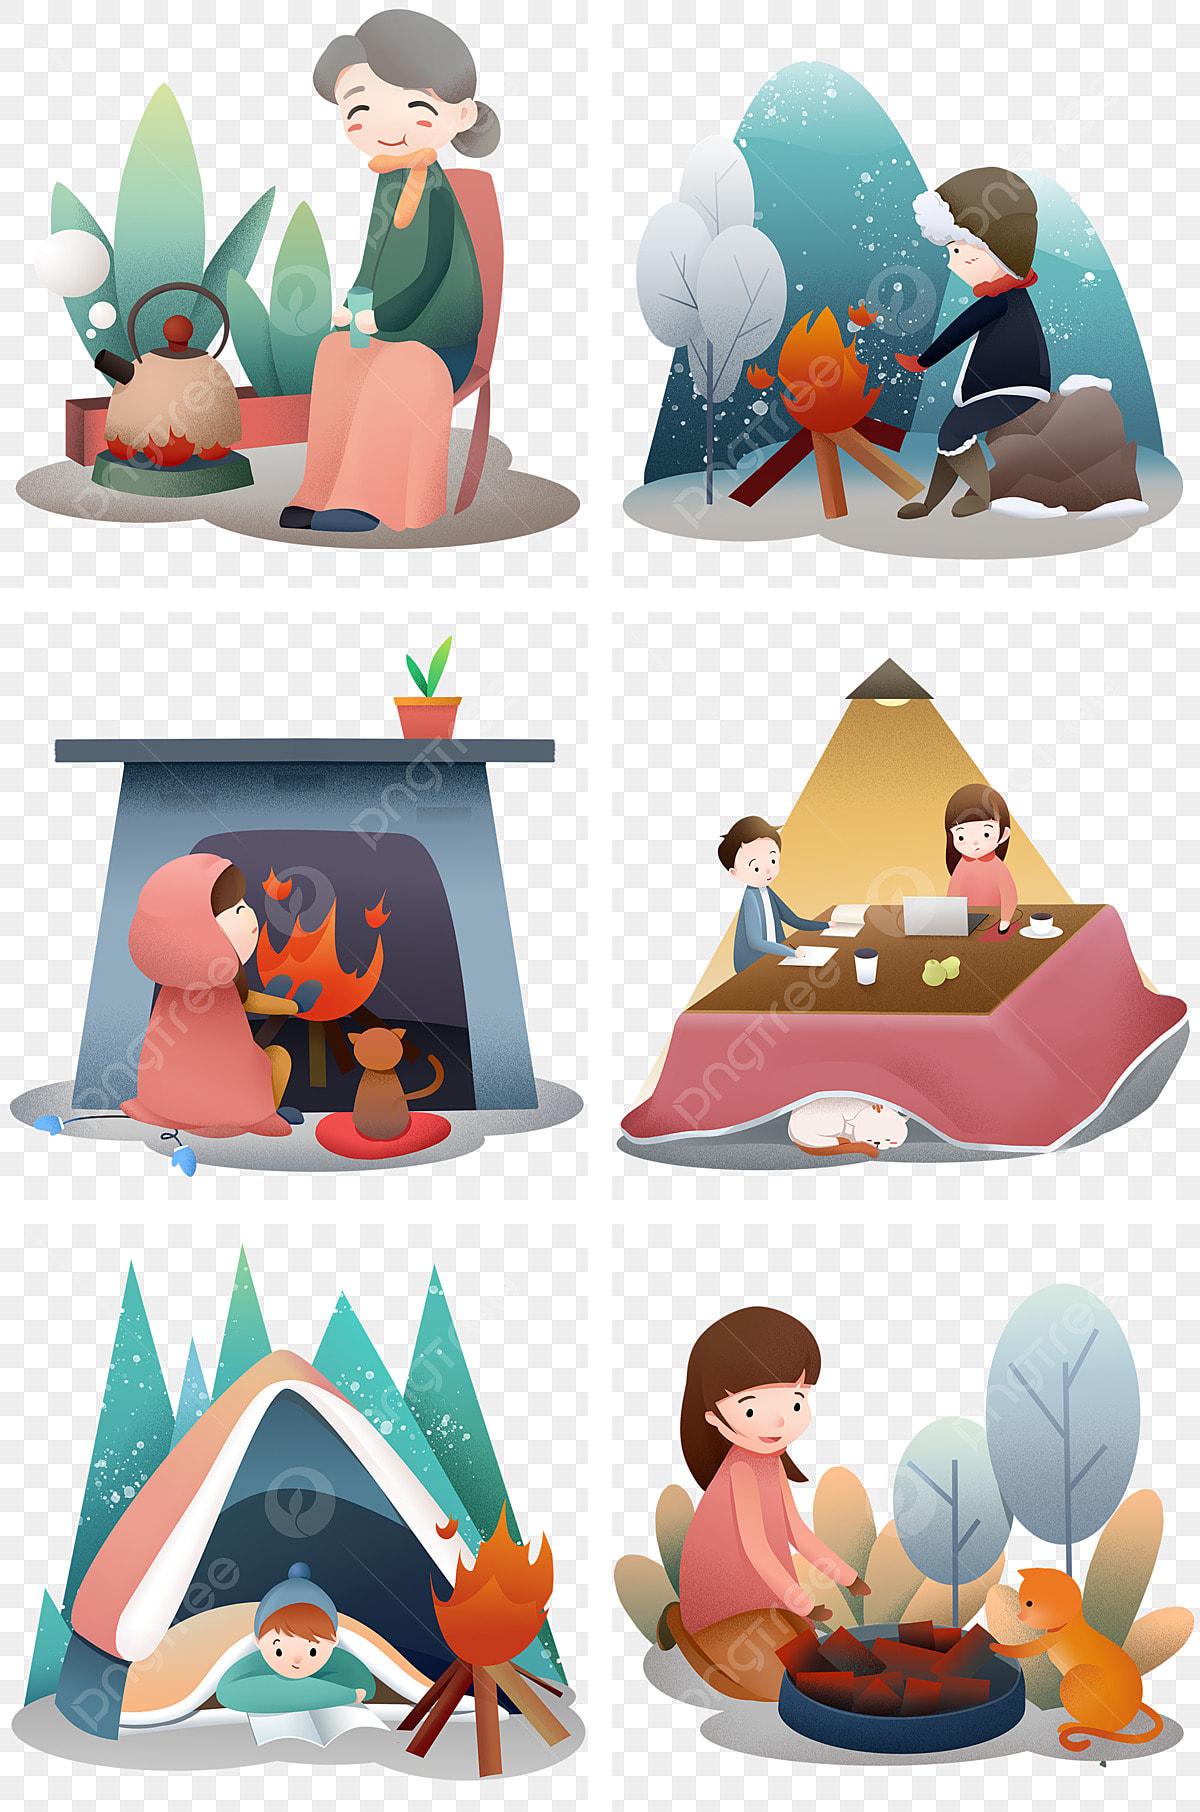 Find hd free Bonfire Clipart S Mores - Transparent Background Campfire  Clipart. Download it free for personal use. in 2020   Transparent  background, Bonfire, Clip art